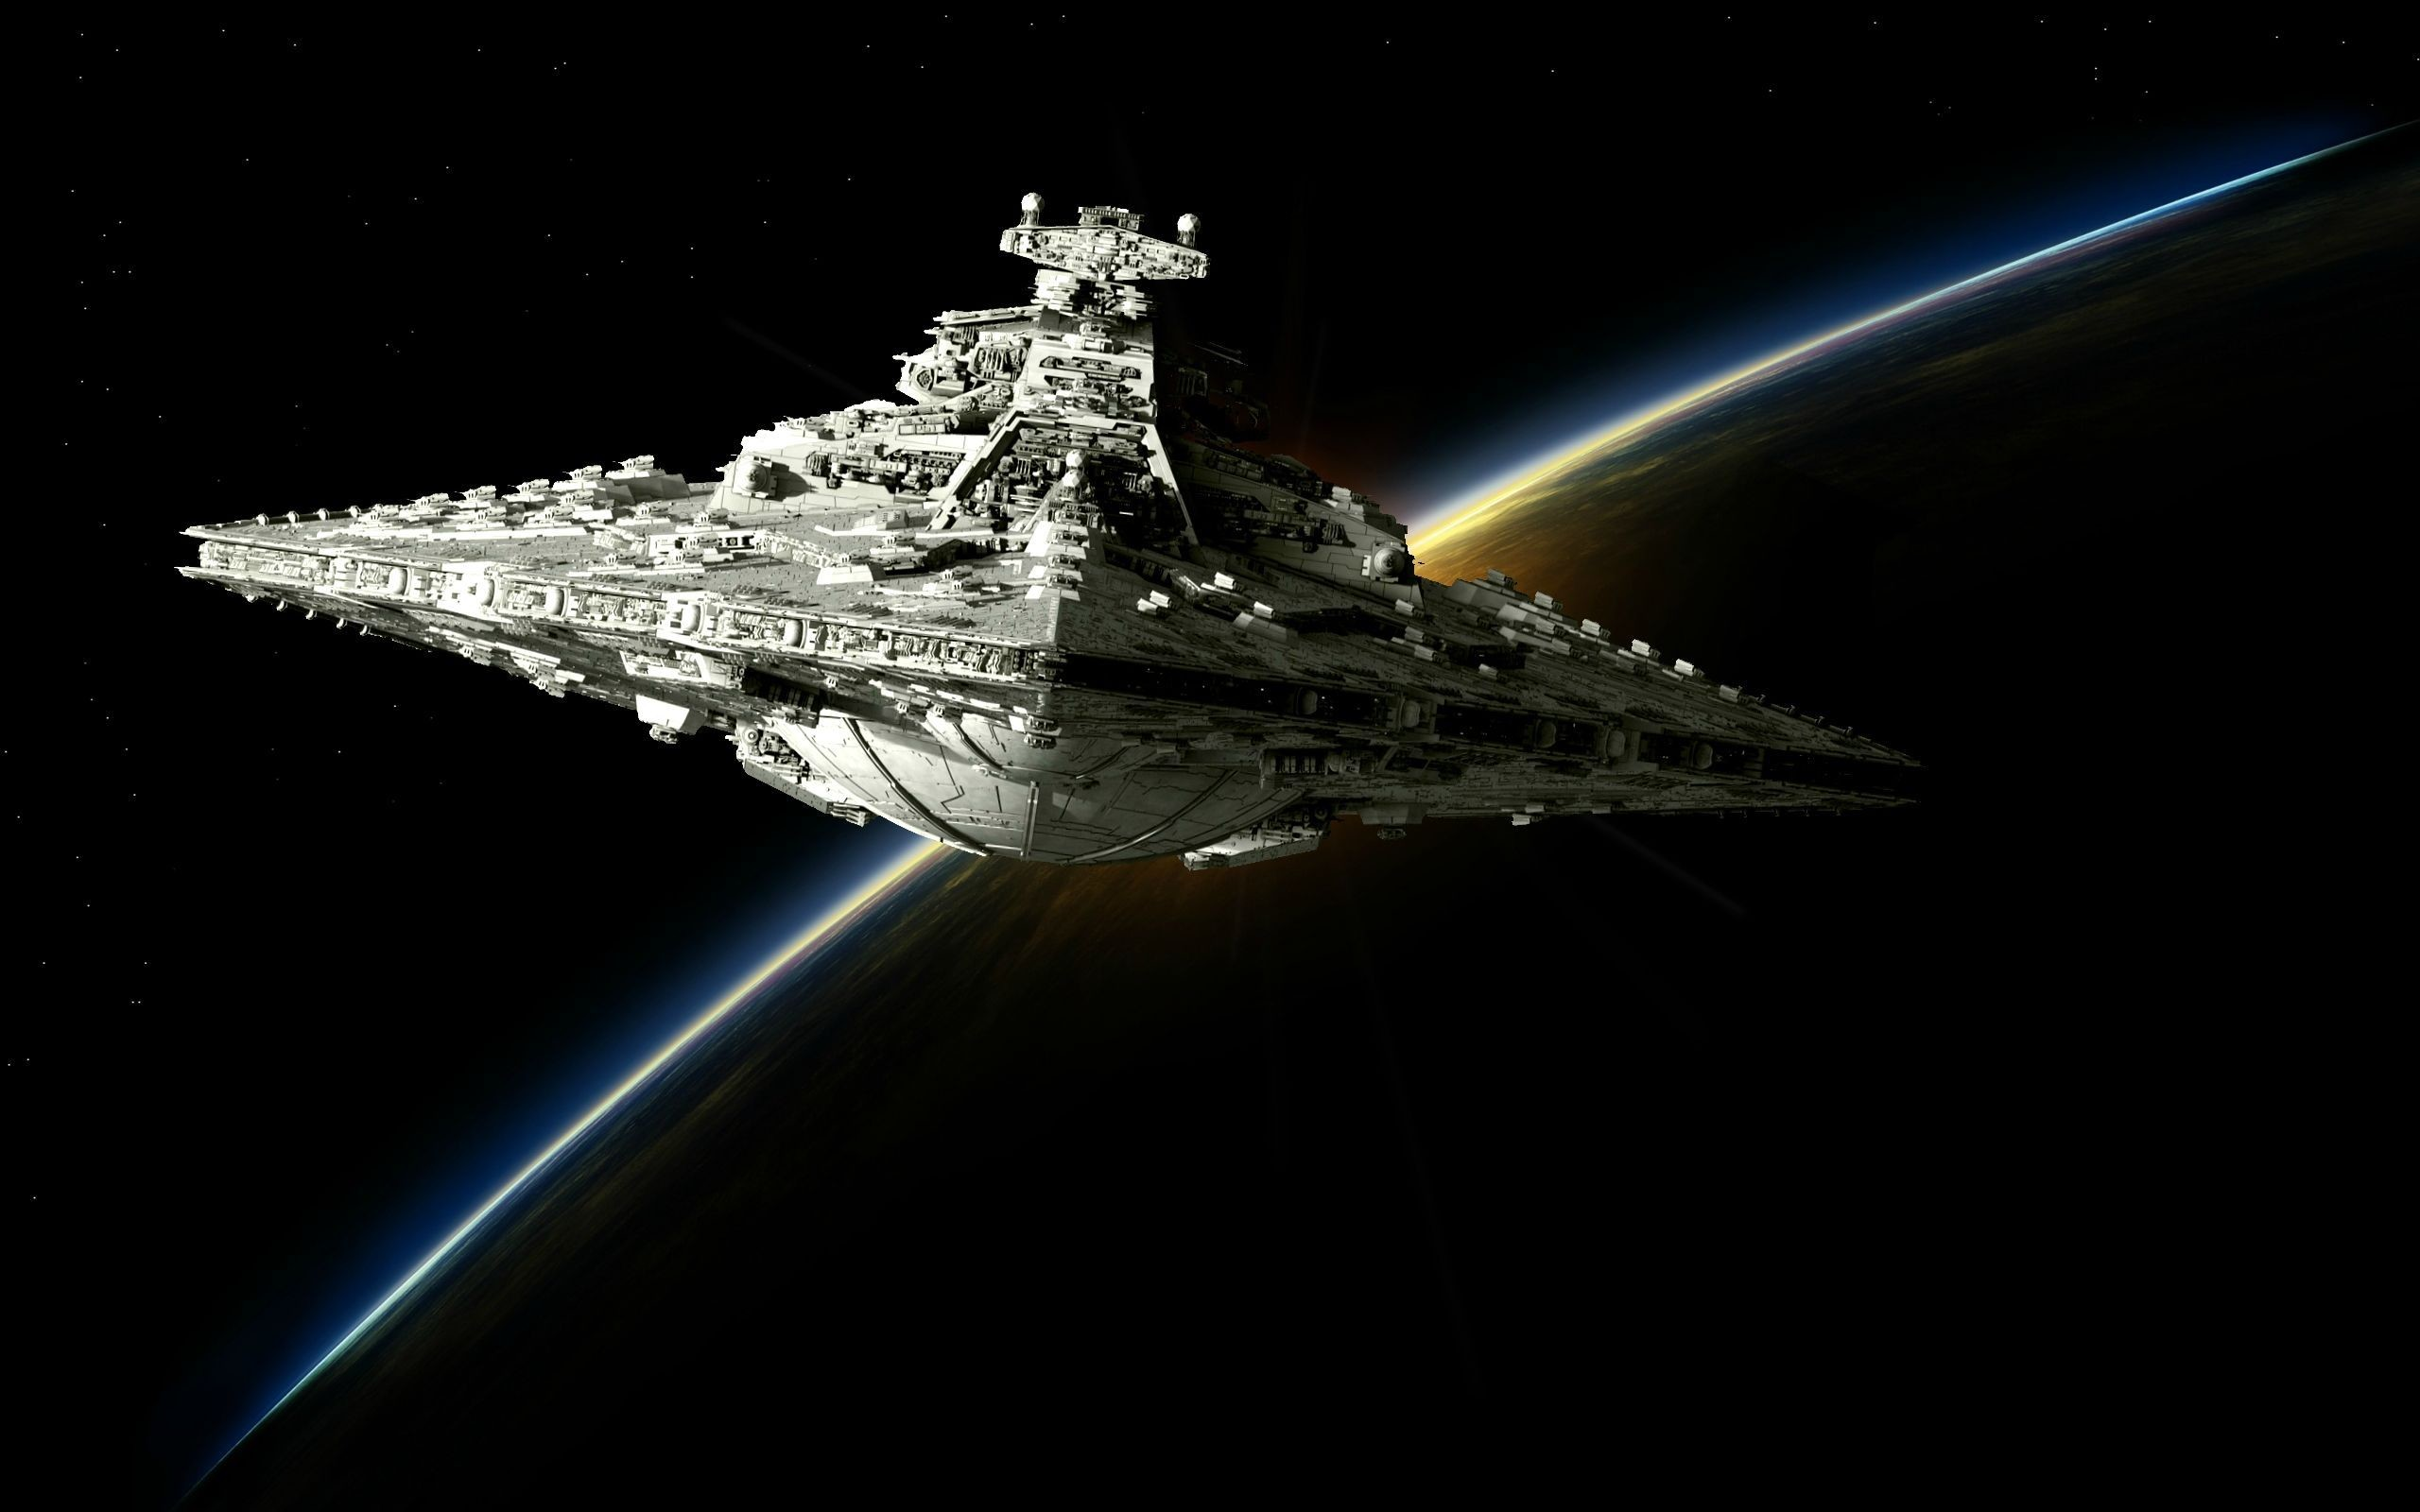 … Imperial Star Destroyer Wallpaper Hd Wallpapersafari. Download